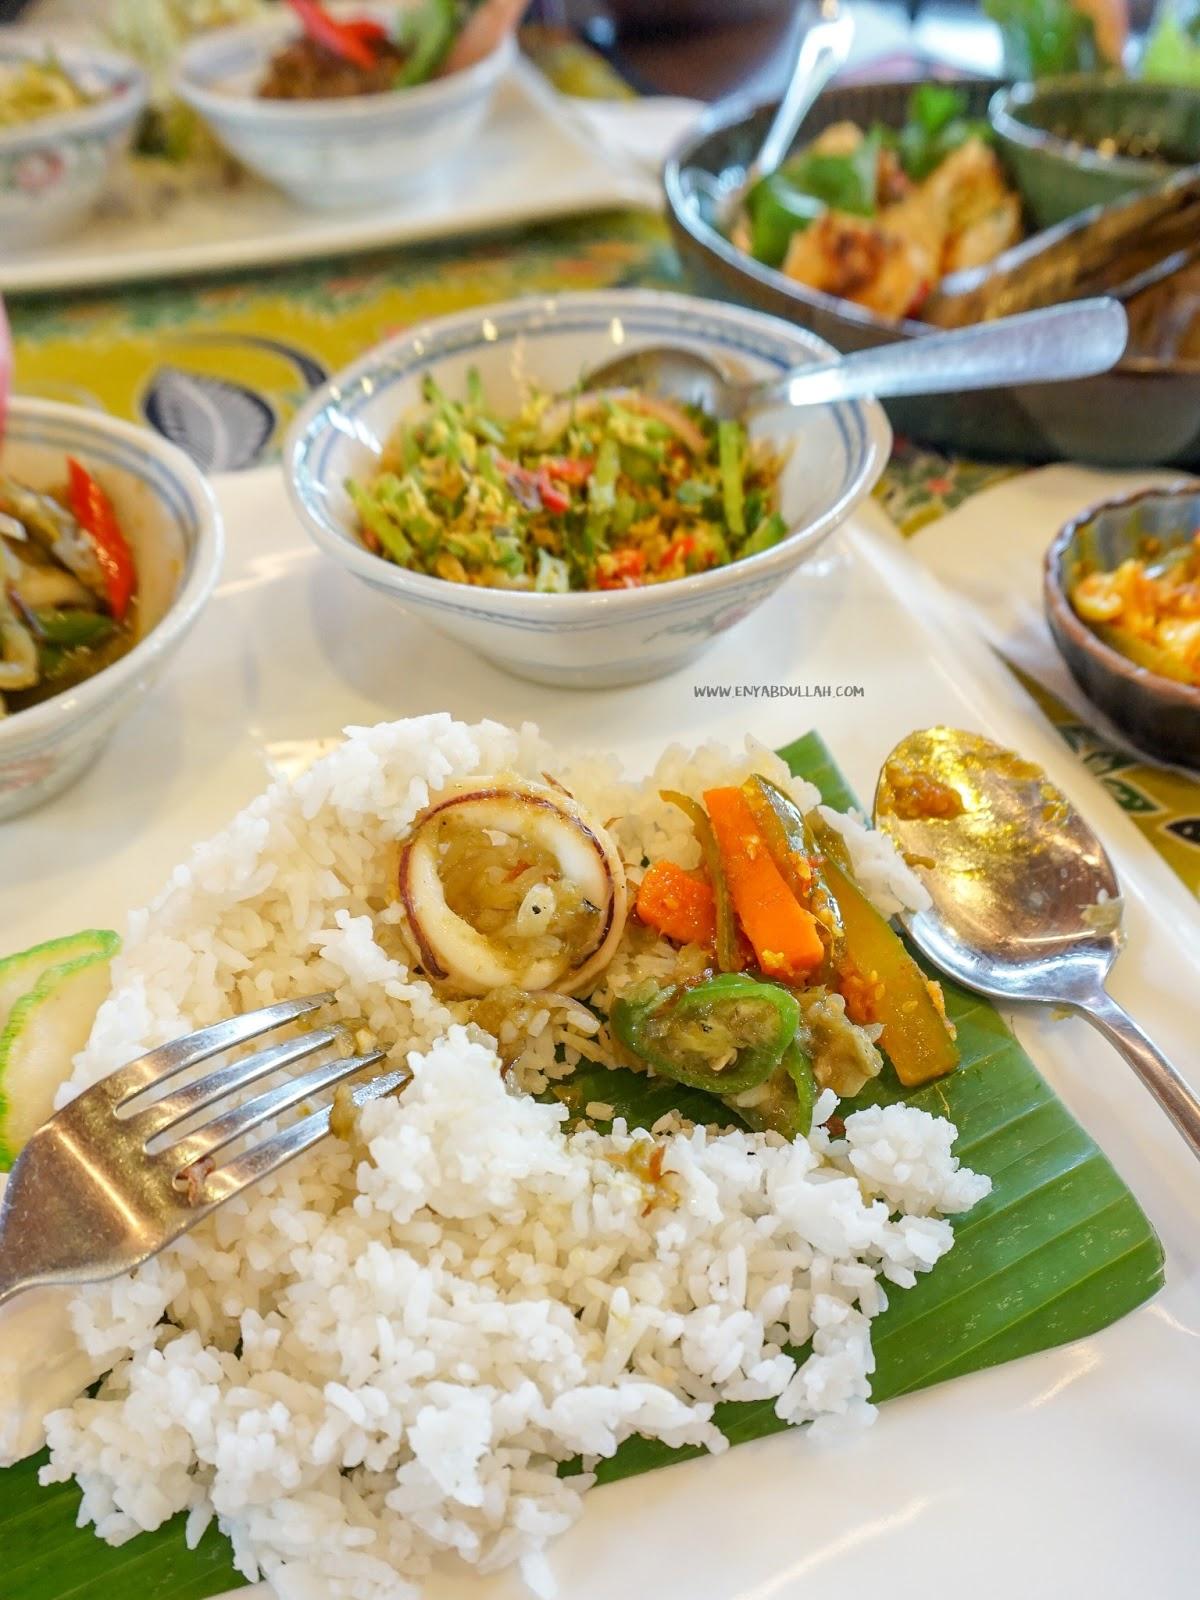 Penang kafe, malay foods penang, malay cuisine penang, irama dining, lagenda kafe, restoren sedap penang